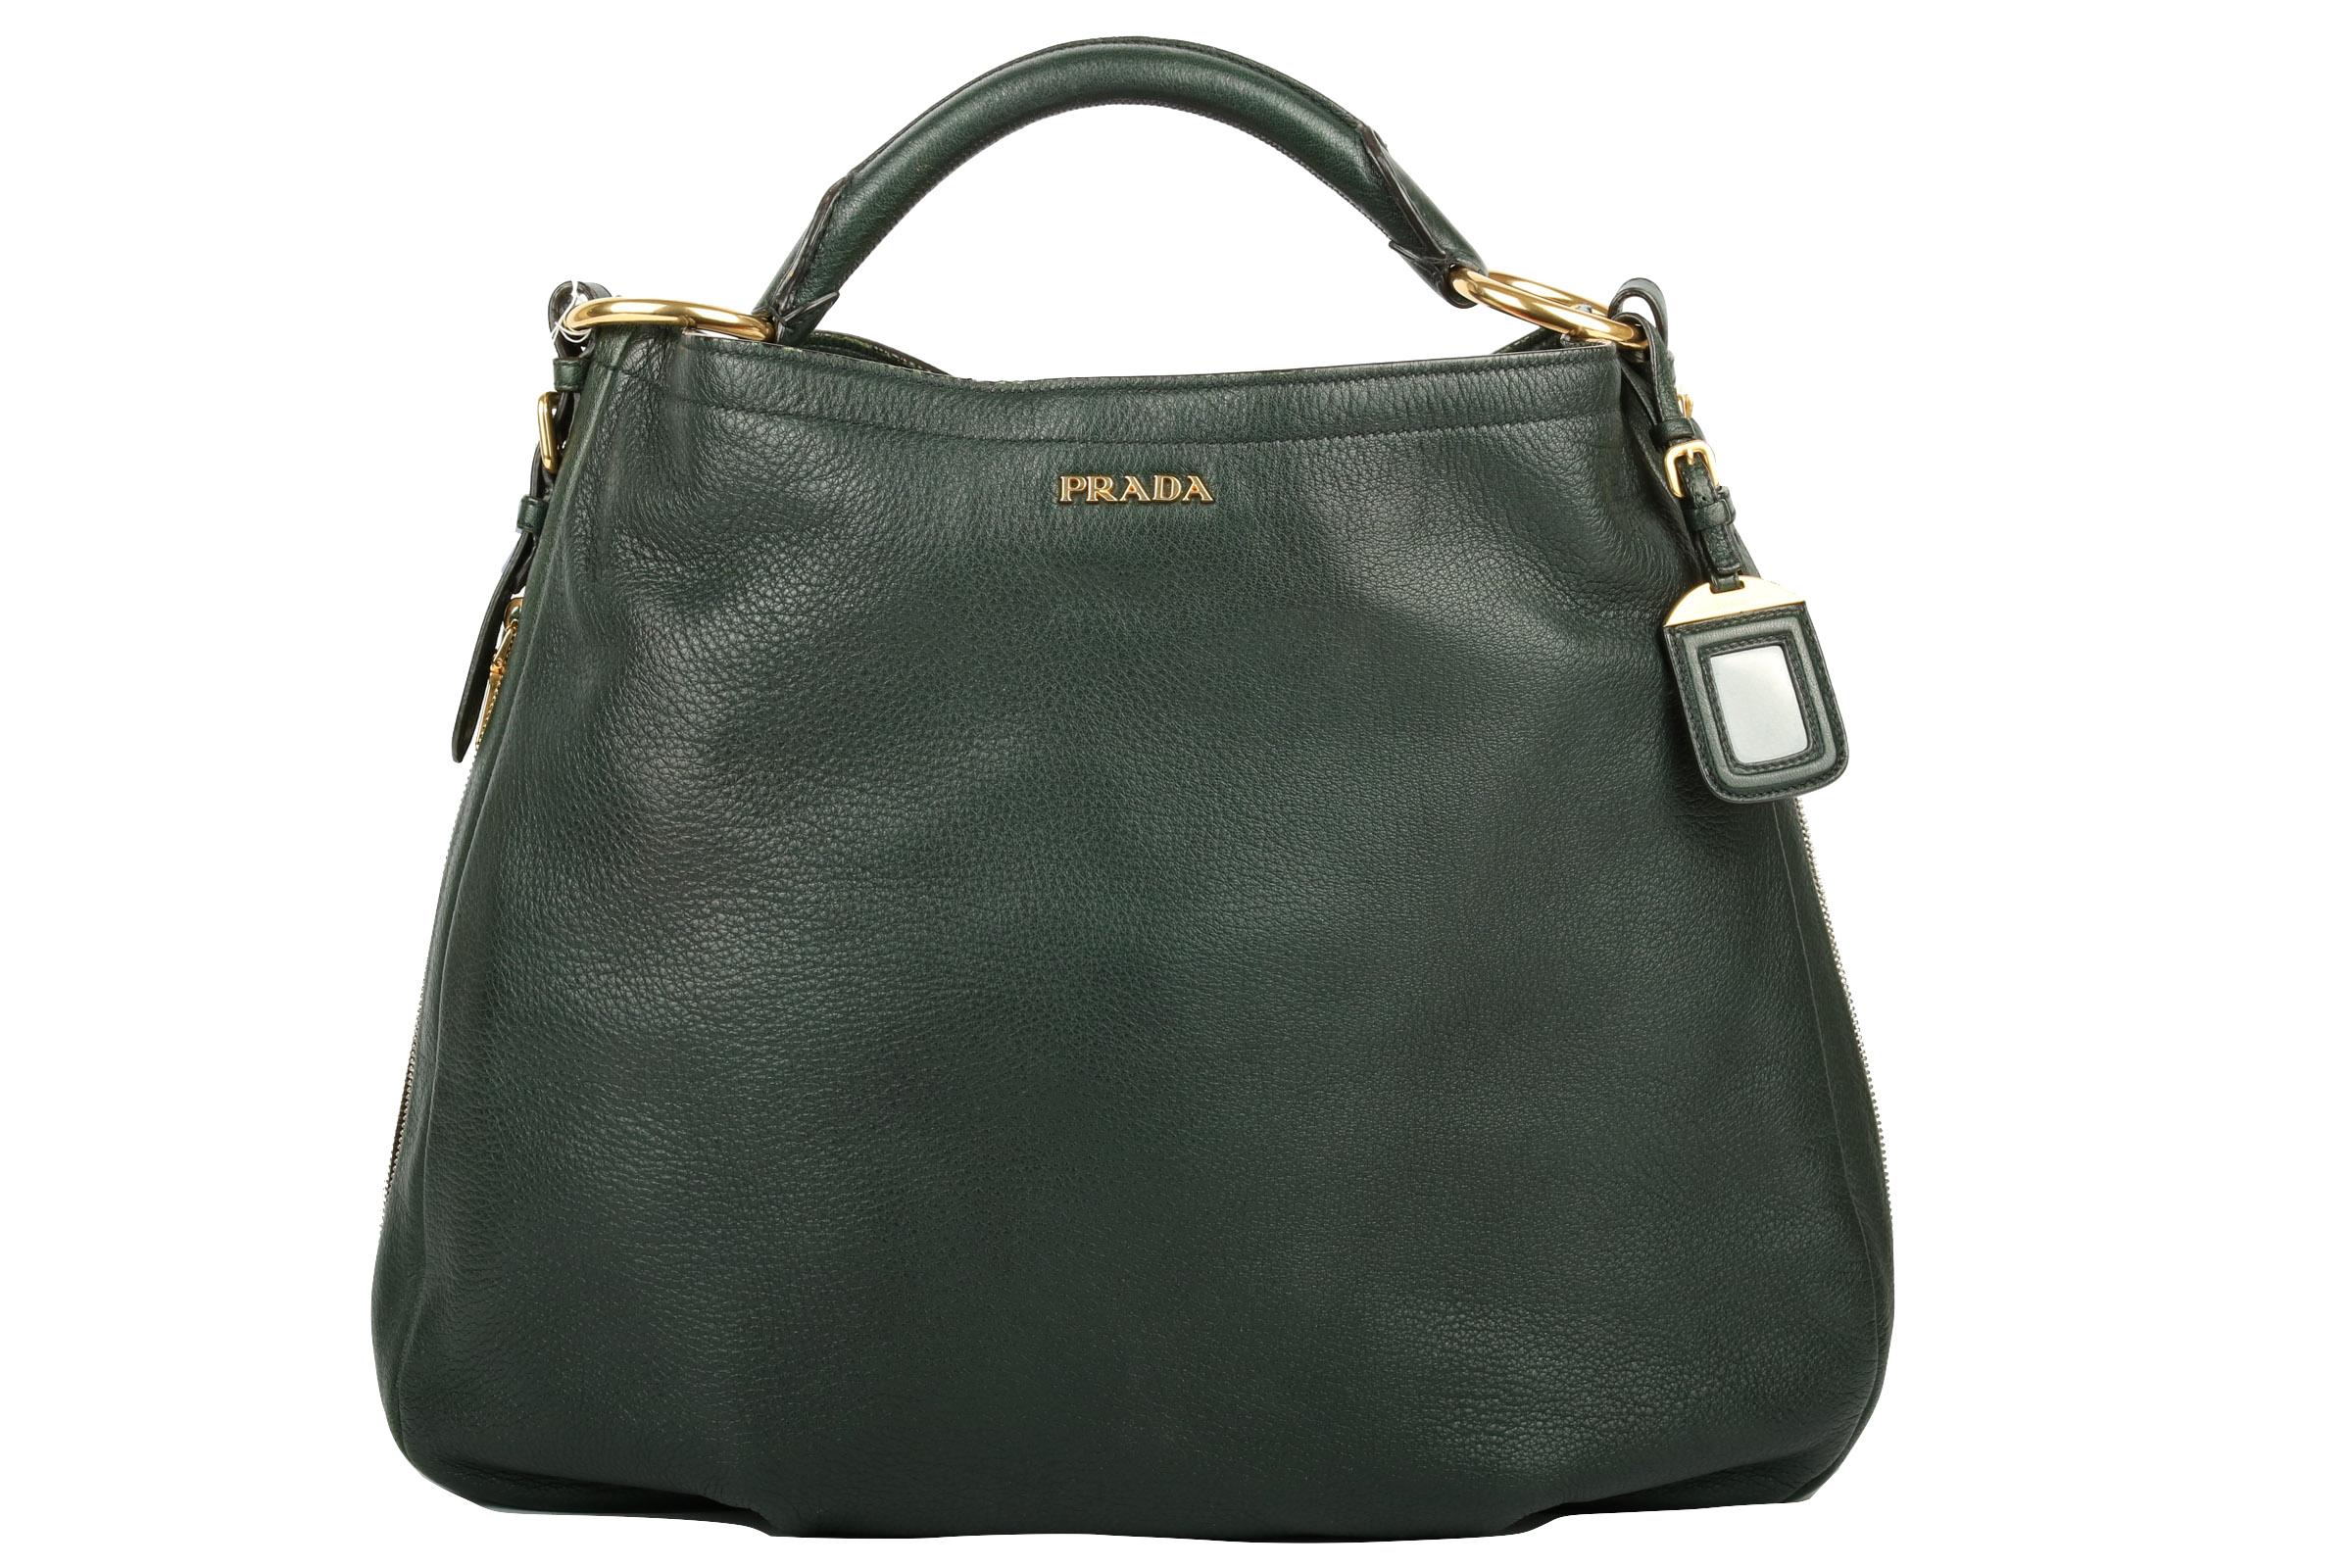 2273e95294 Second Hand Designer-Handtaschen & -Accessoires | Luxussachen.com ...